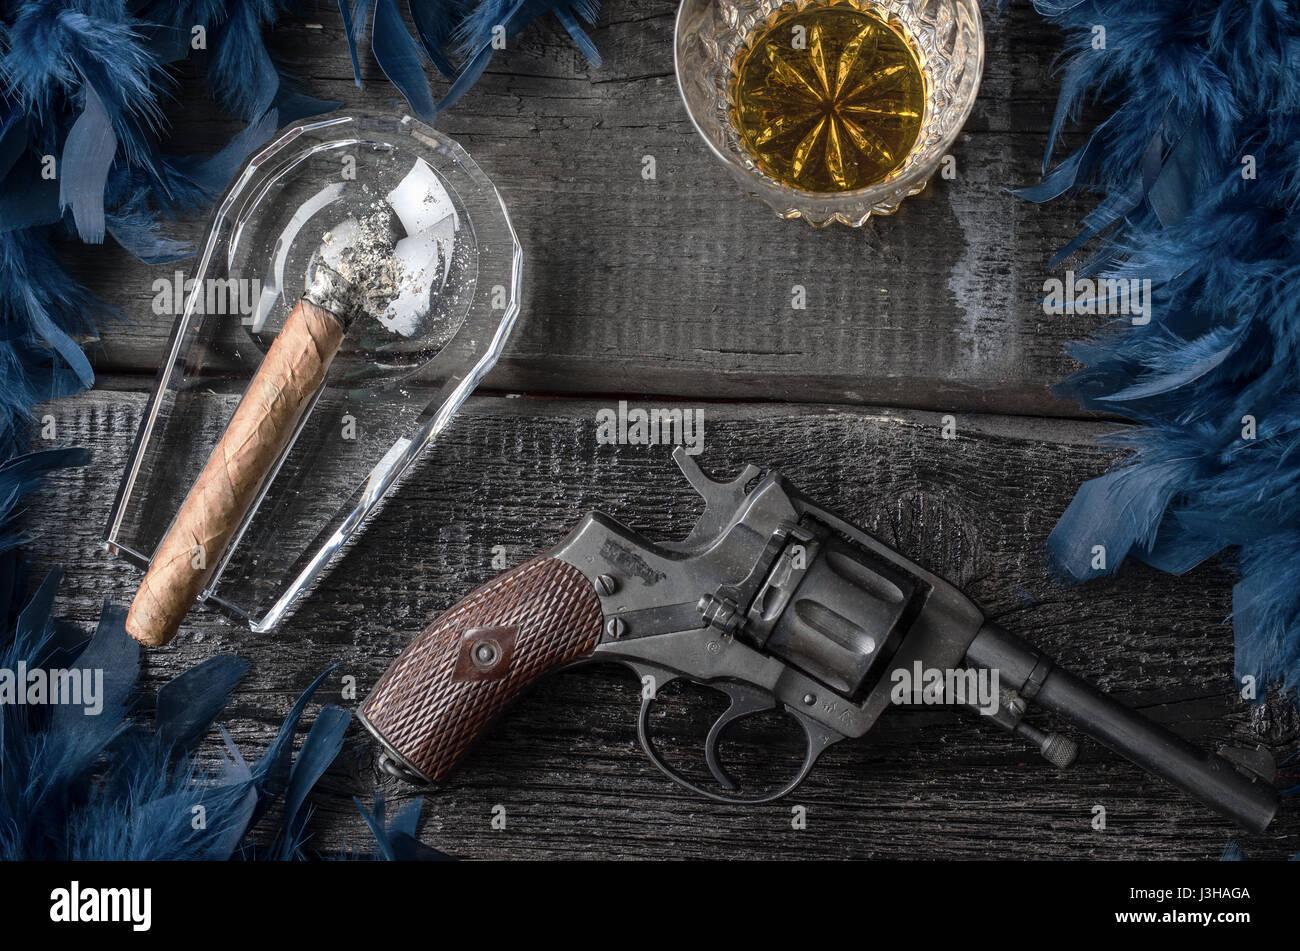 Thompson gun, revolver, cigar on ashtray, whiskey glass and blue feather boa - Stock Image